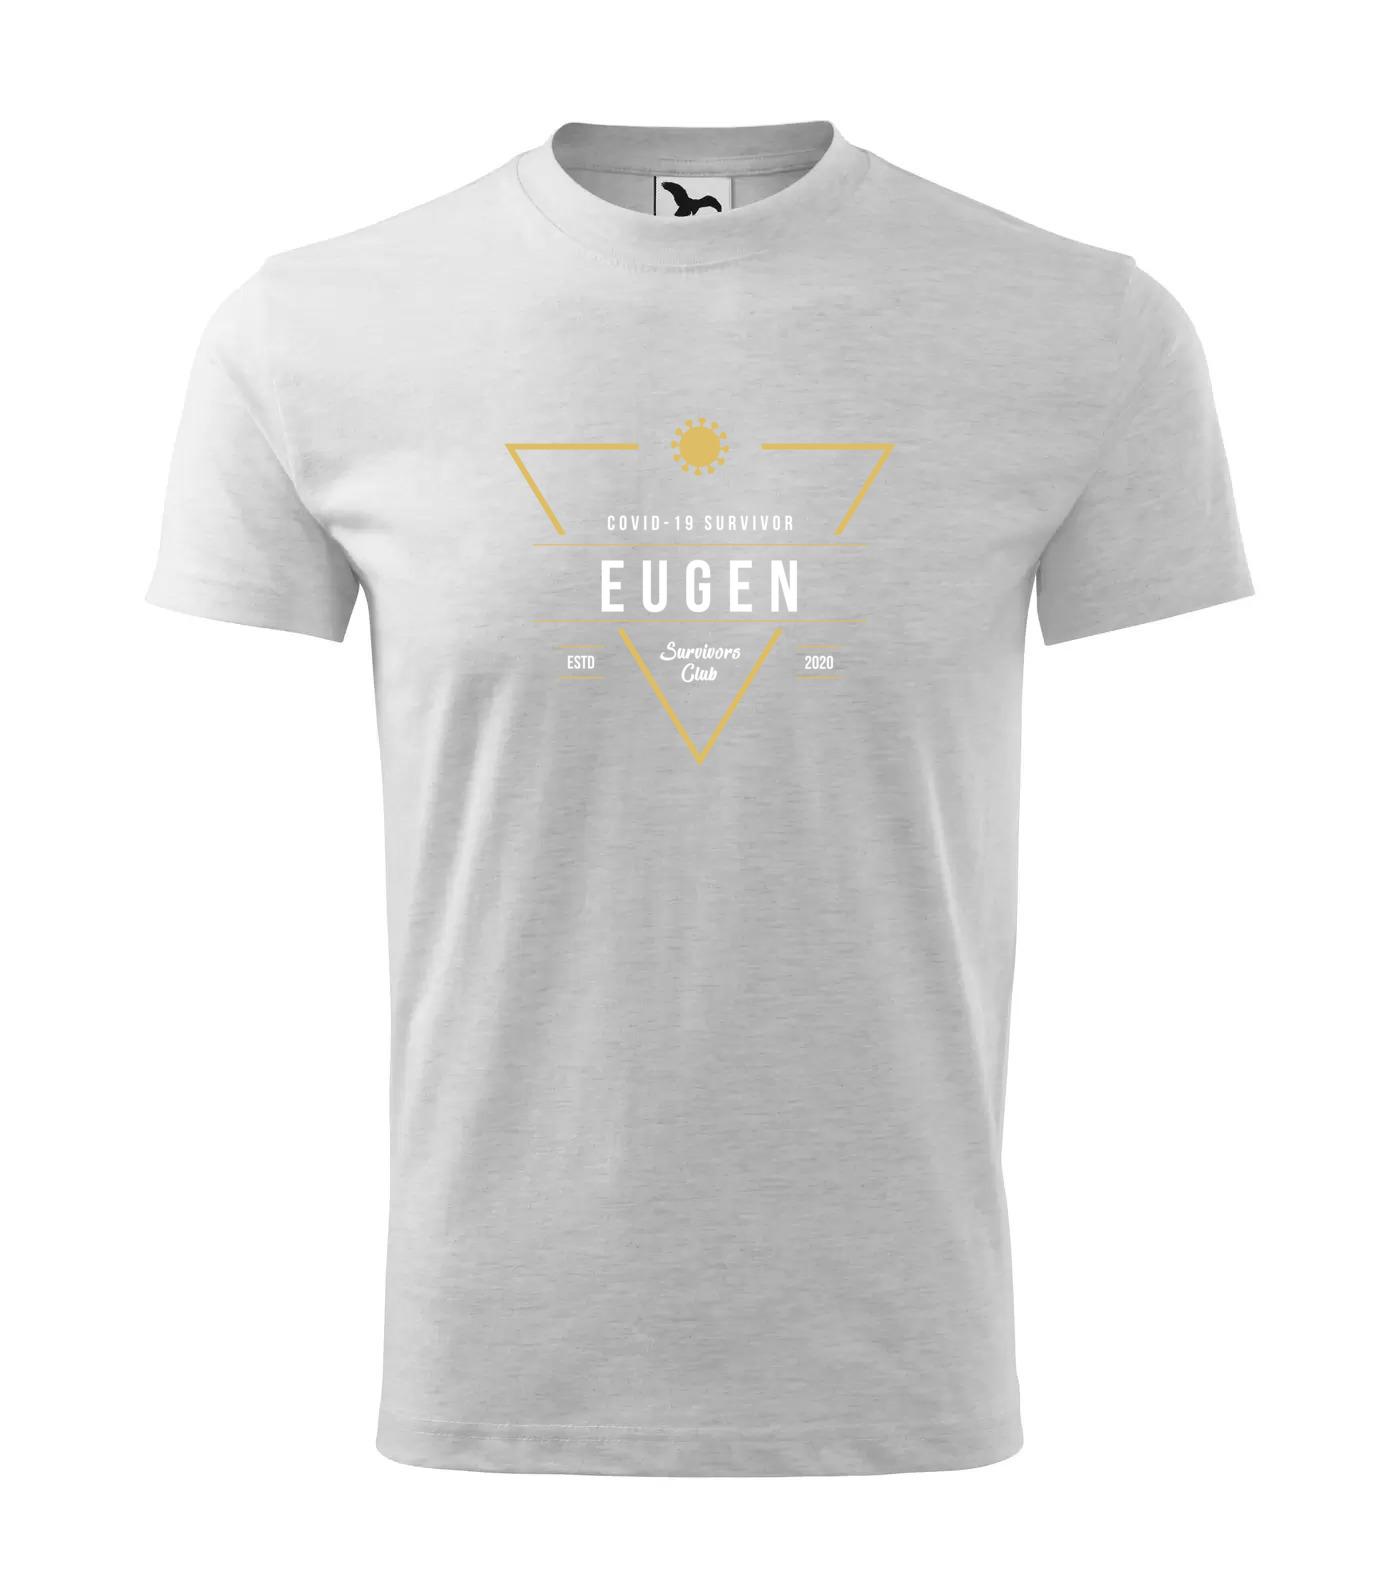 Tričko Survivor Club Eugen